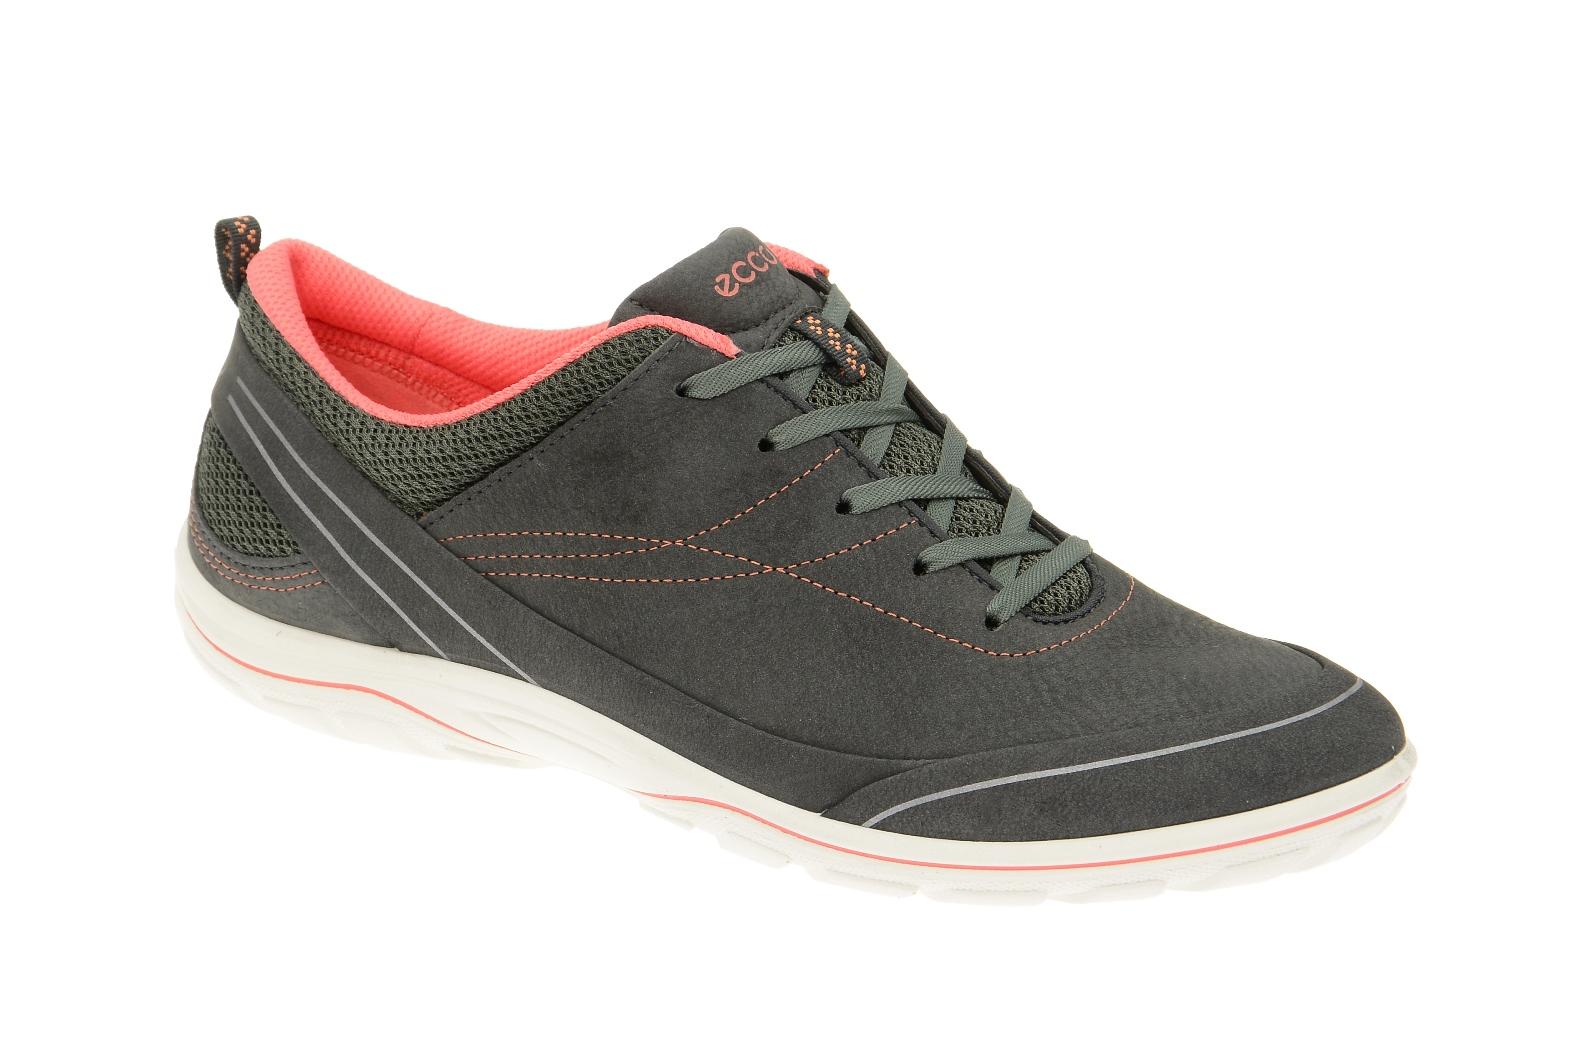 pretty nice fa455 0504b Ecco Arizona Schuhe grau pink - 83650358925